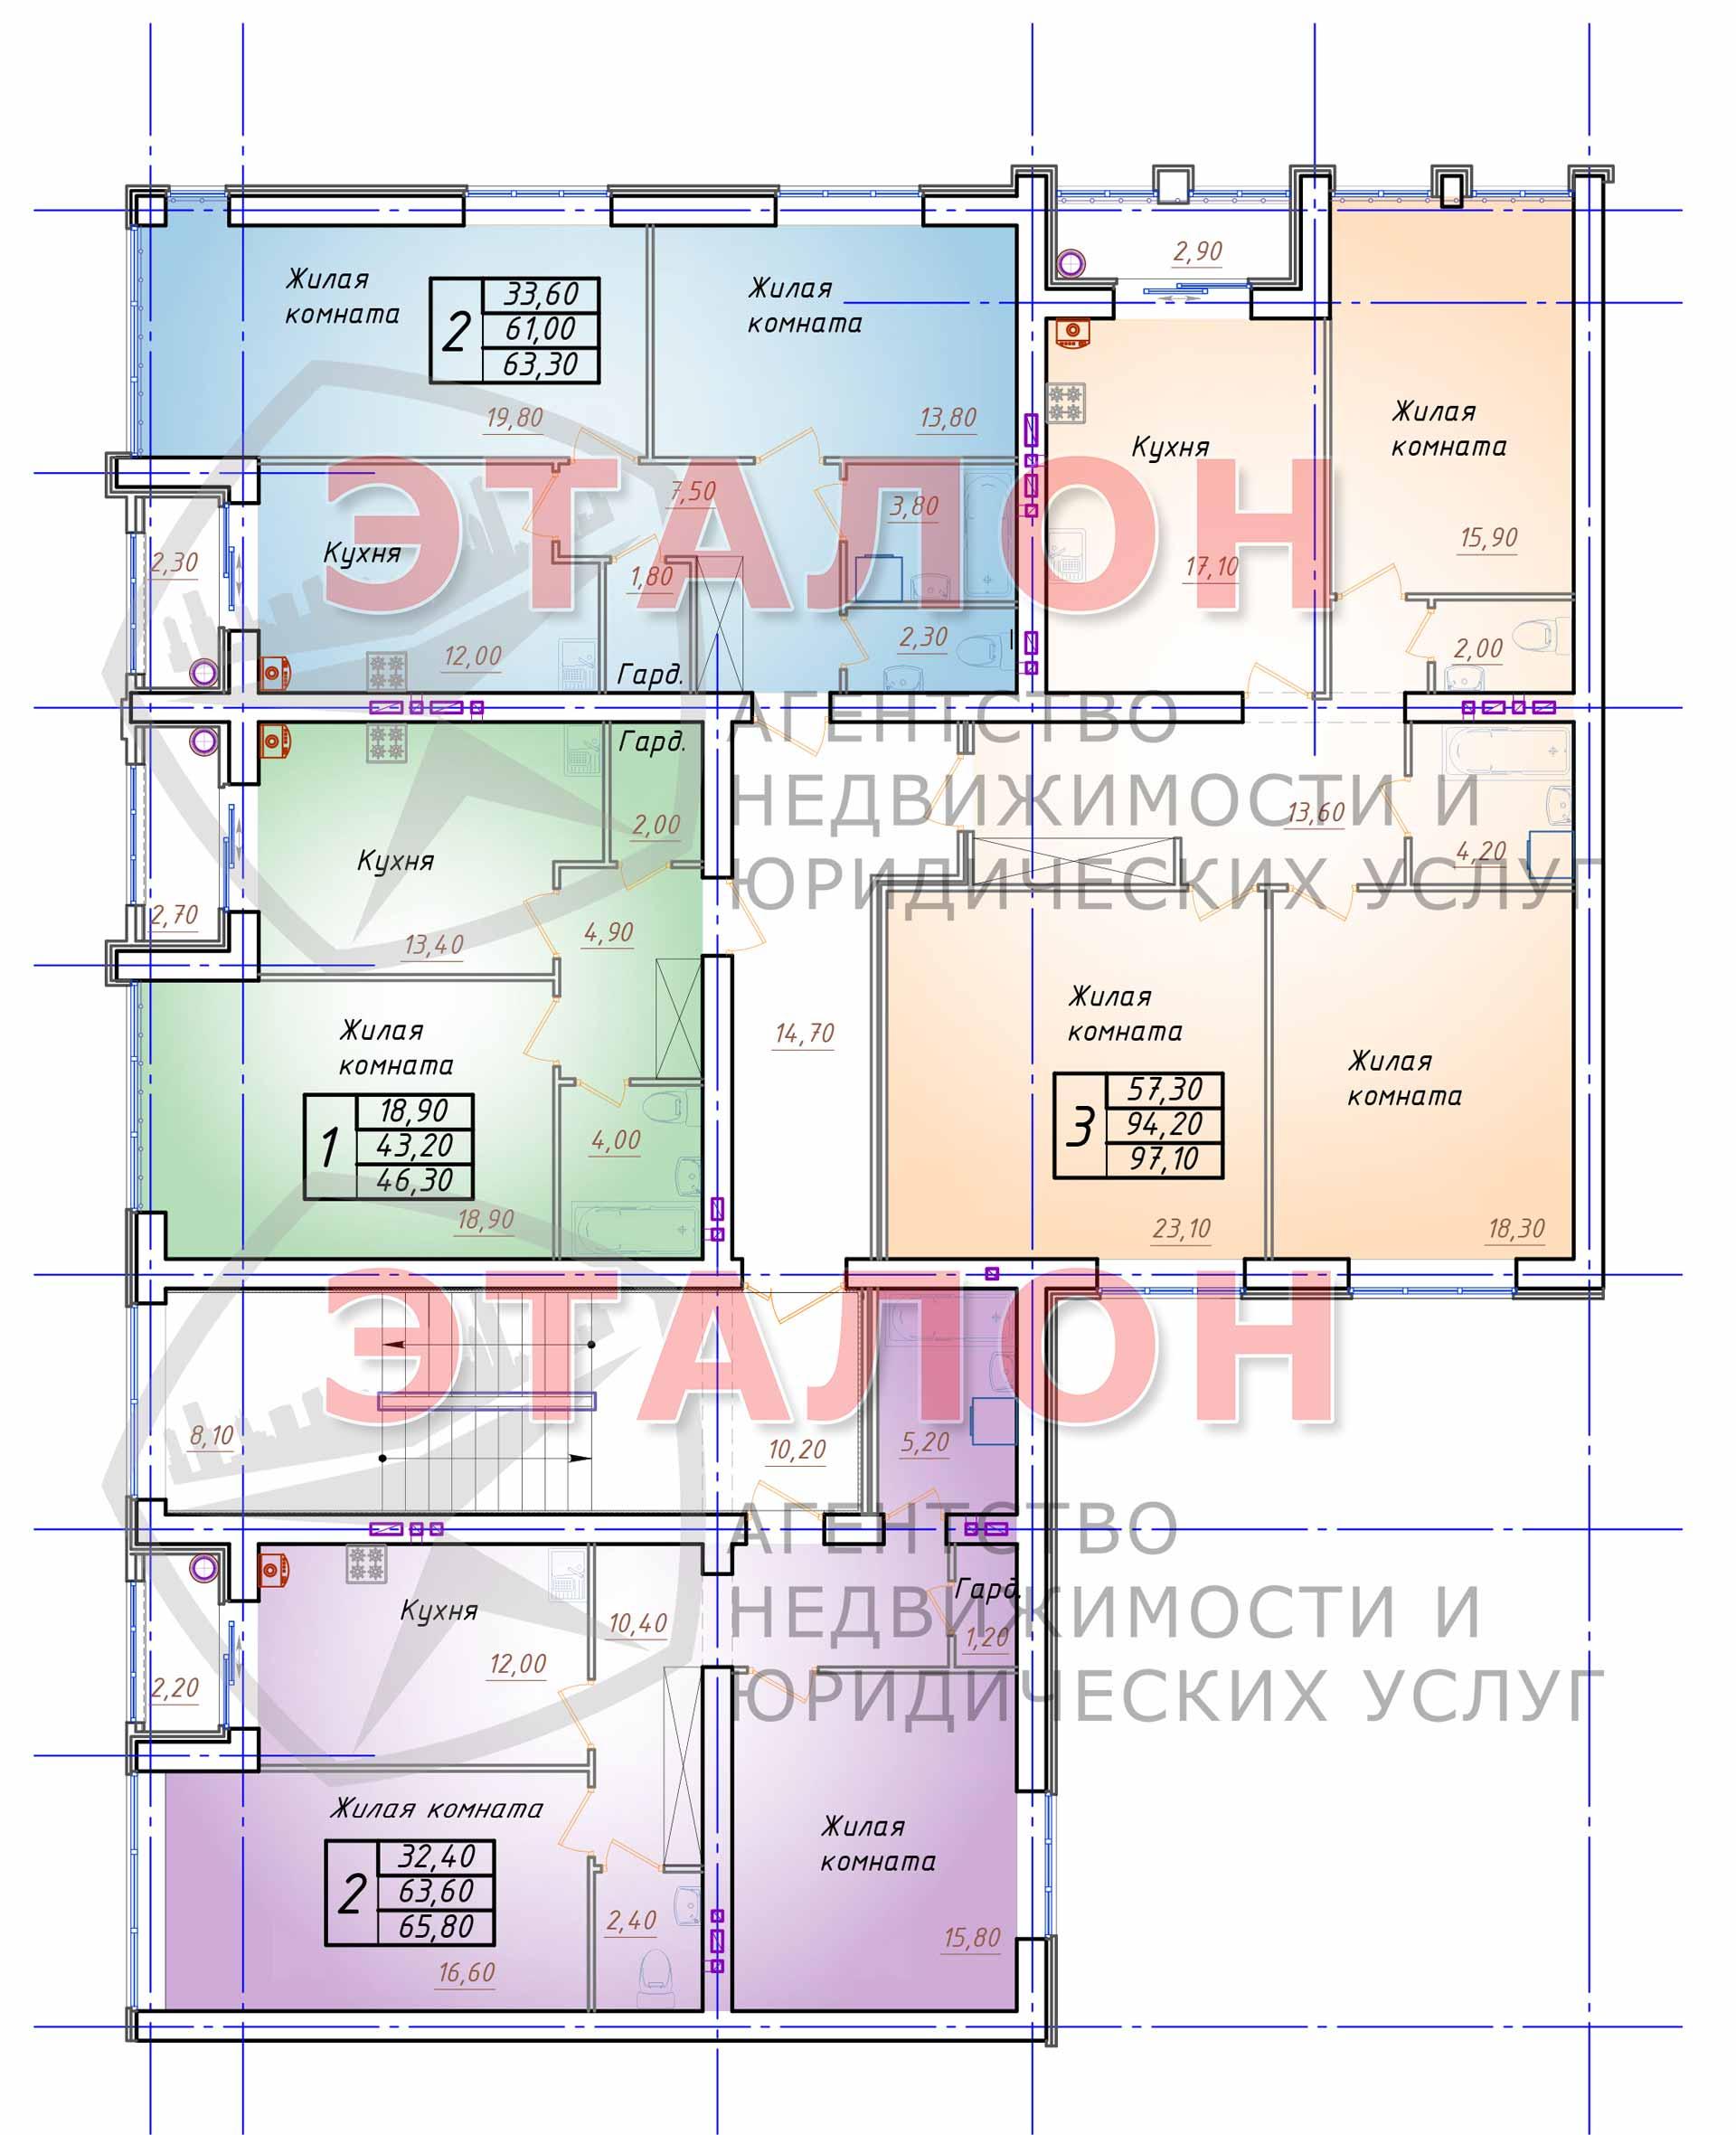 Блок 3. Подъезд 3. План 3-го этажа